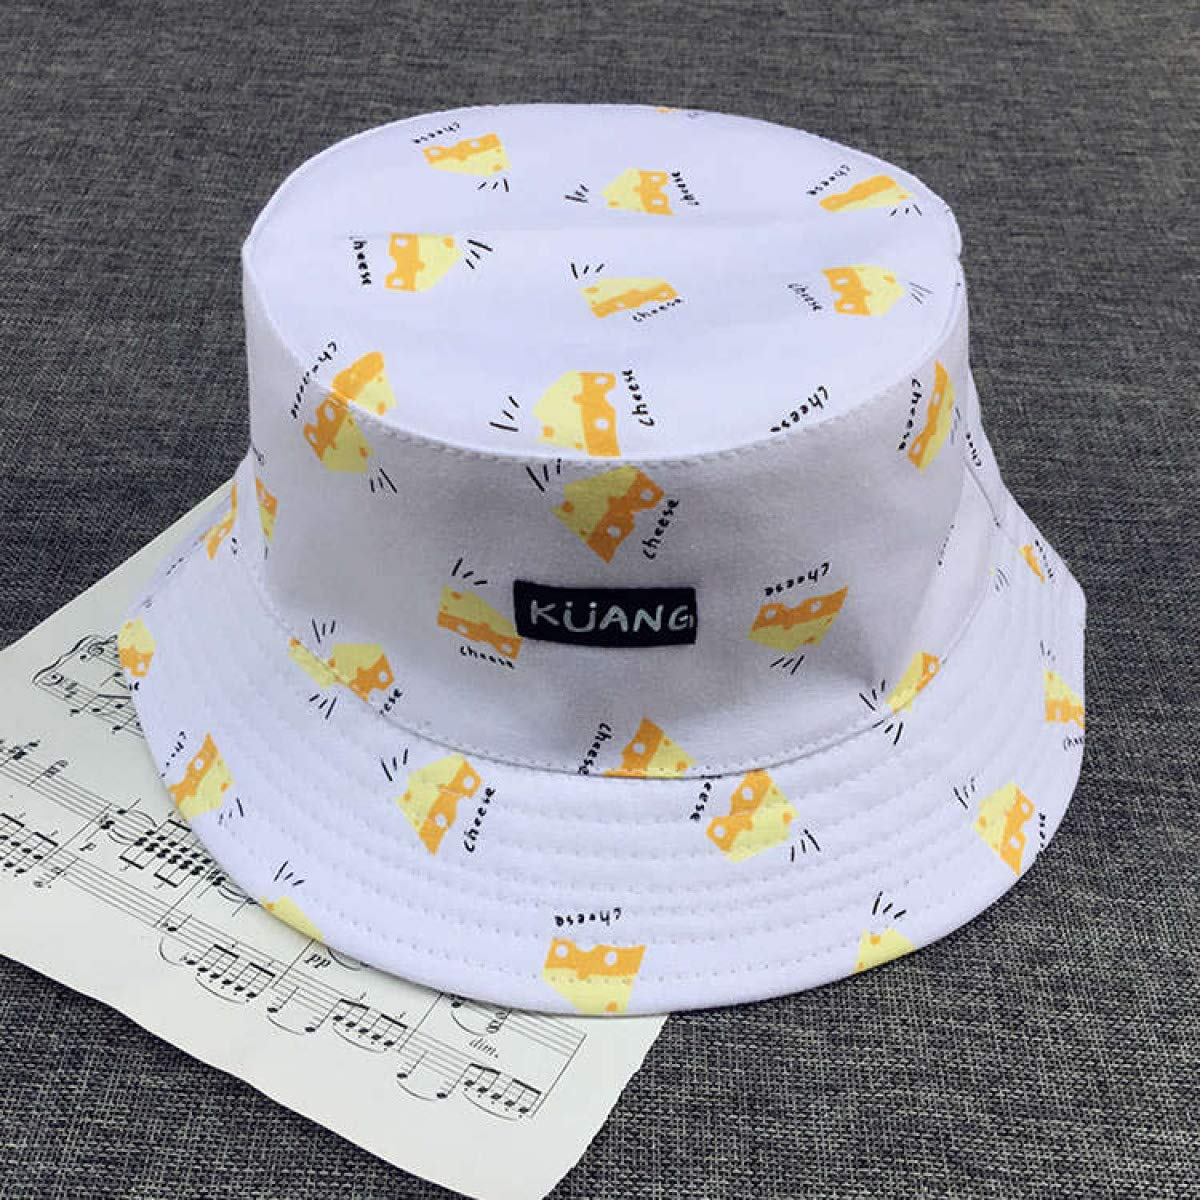 Myhome99 Bucket Cap Man Women Unisex Cotton Banana Hat Bob Caps Hip Hop Outdoor Sports Summer Ladies Beach Sun Fishing Bucket Hats Pink